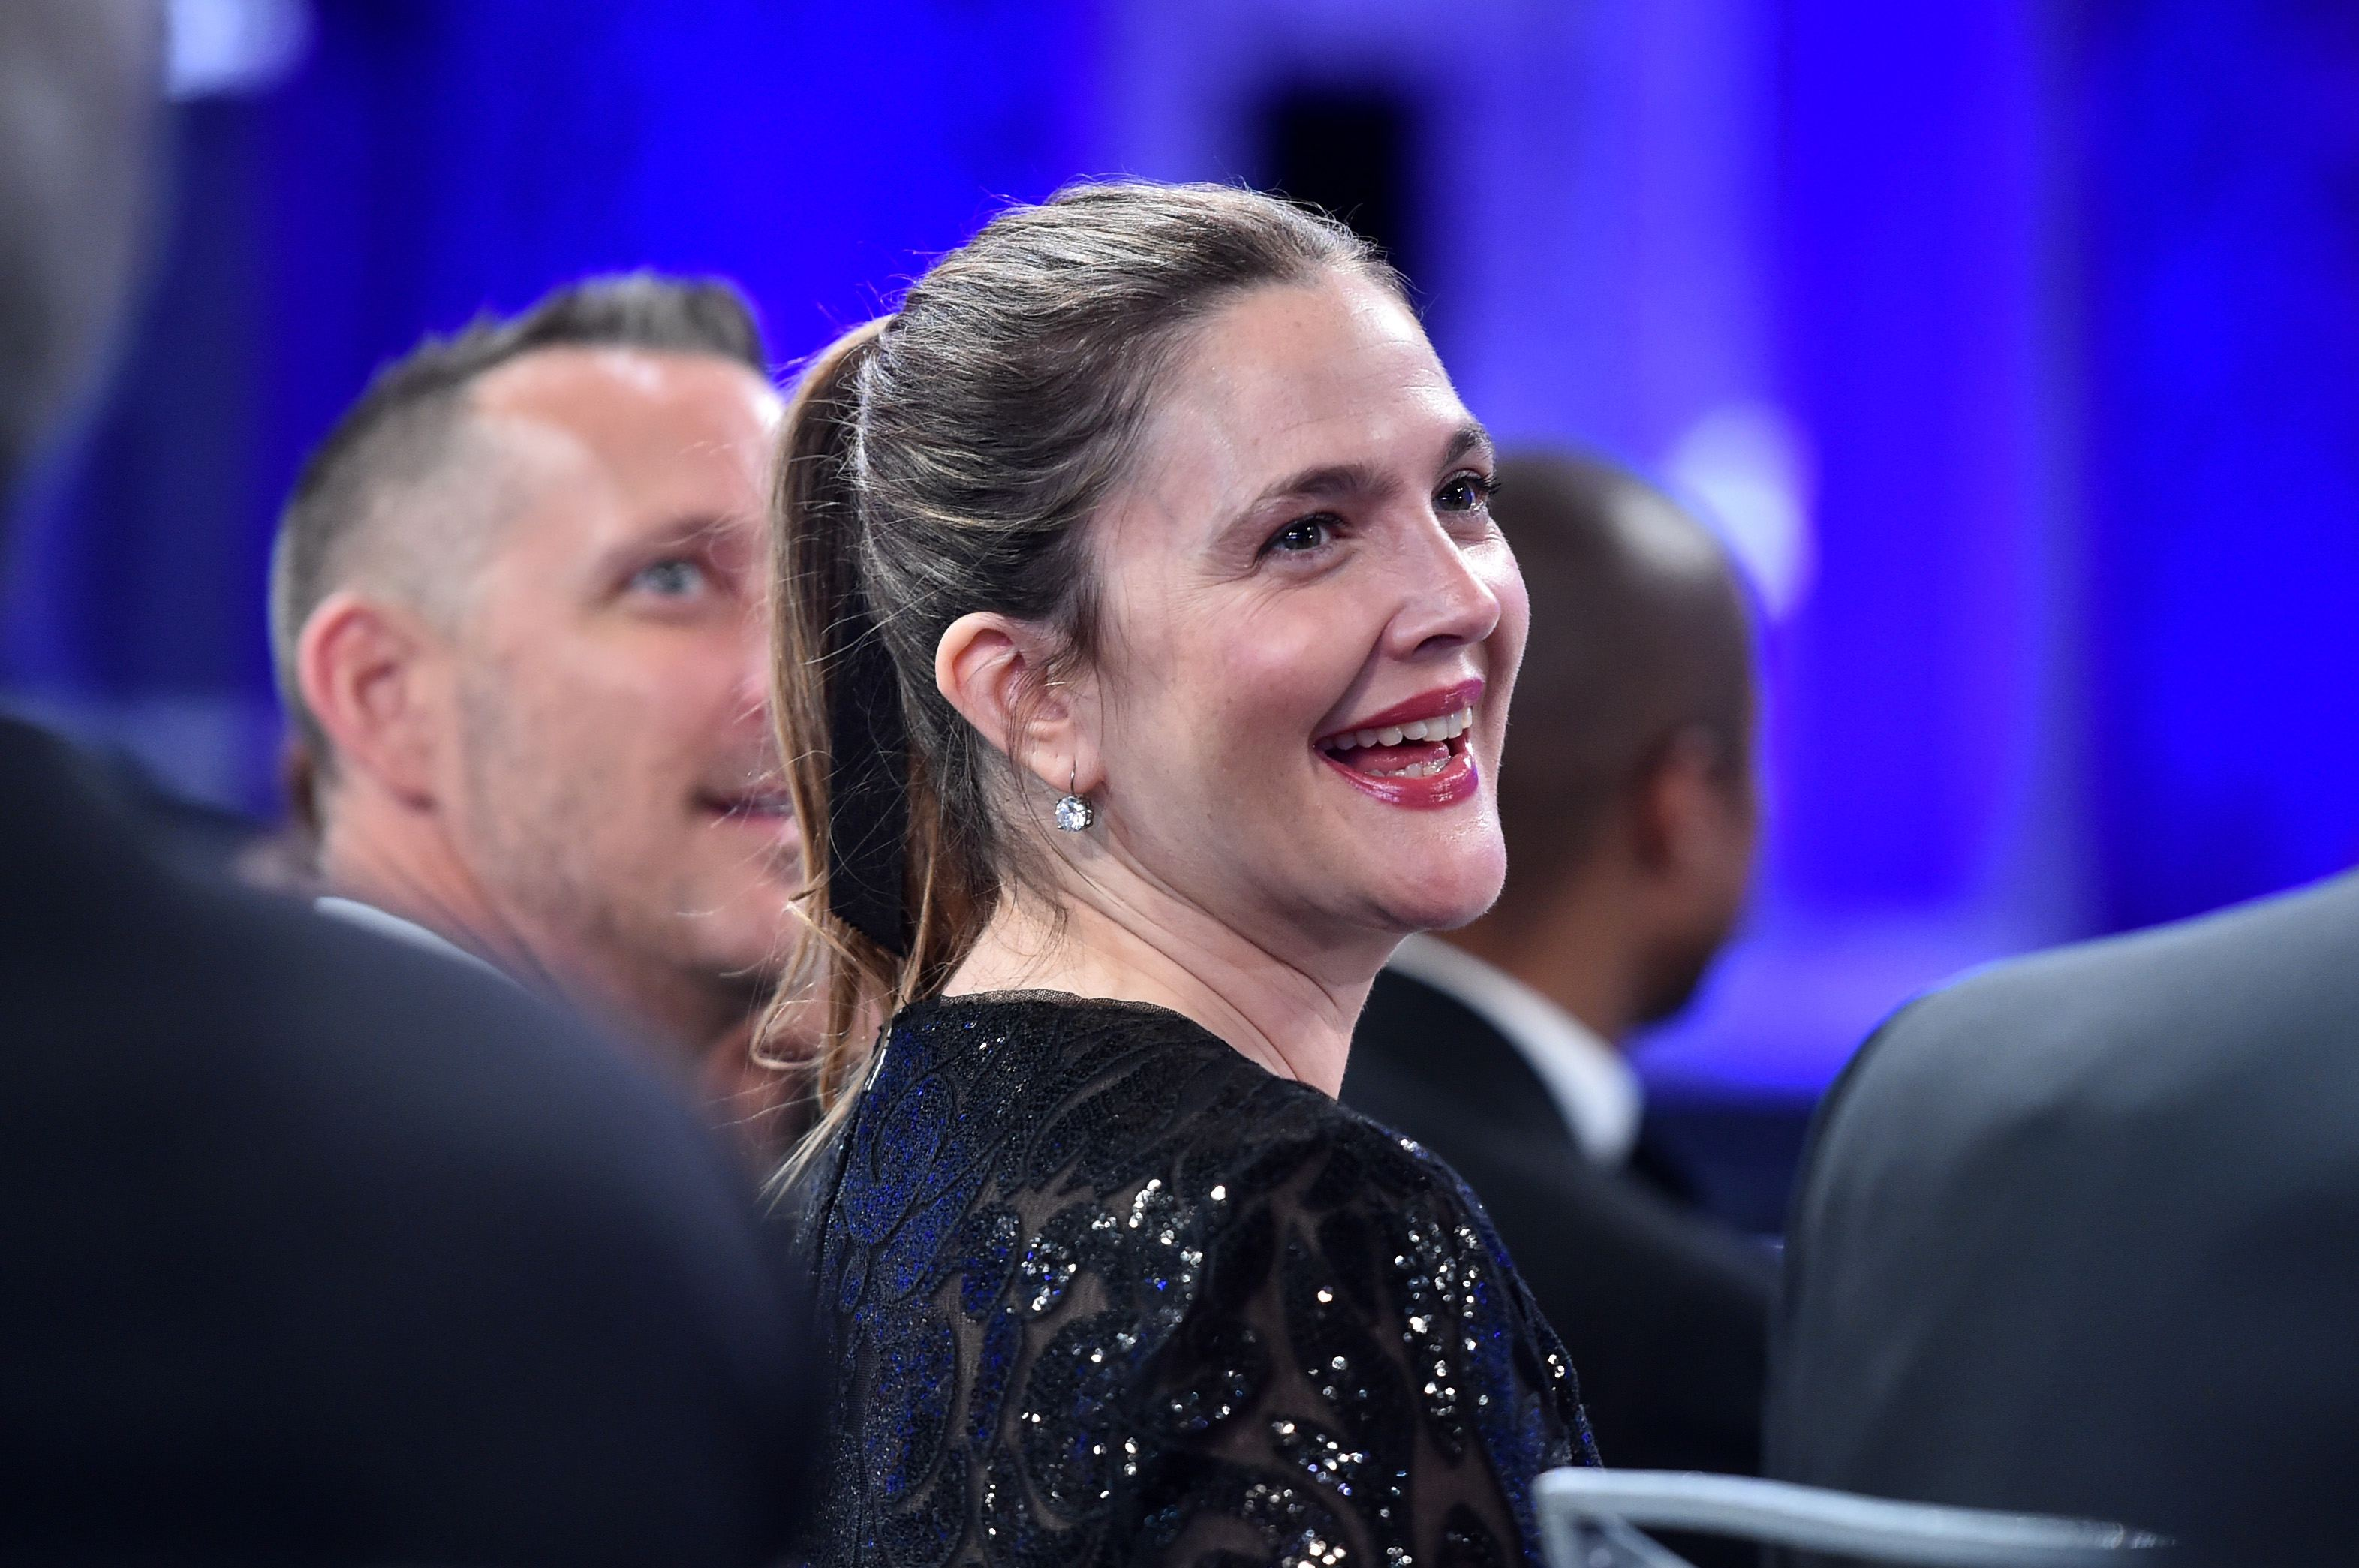 Drew Barrymore laughs